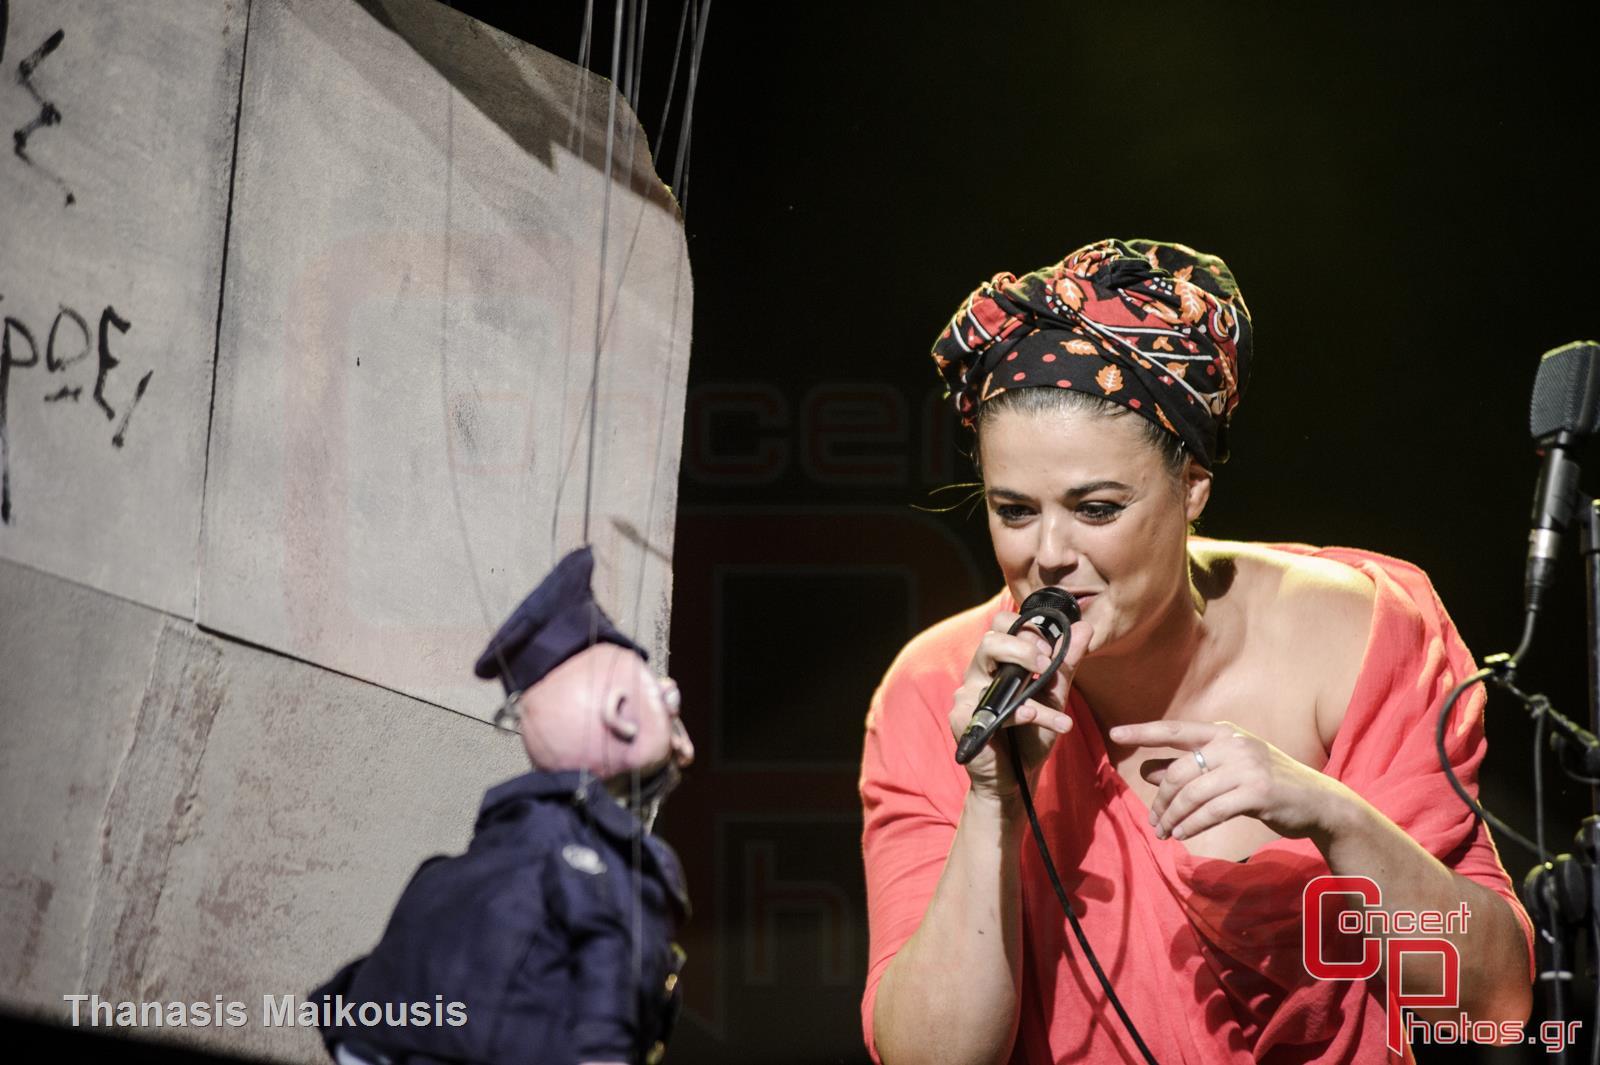 Active Member - Τραγούδα μας να φύγει το σκοτάδι- photographer: Thanasis Maikousis - concertphotos_-5053